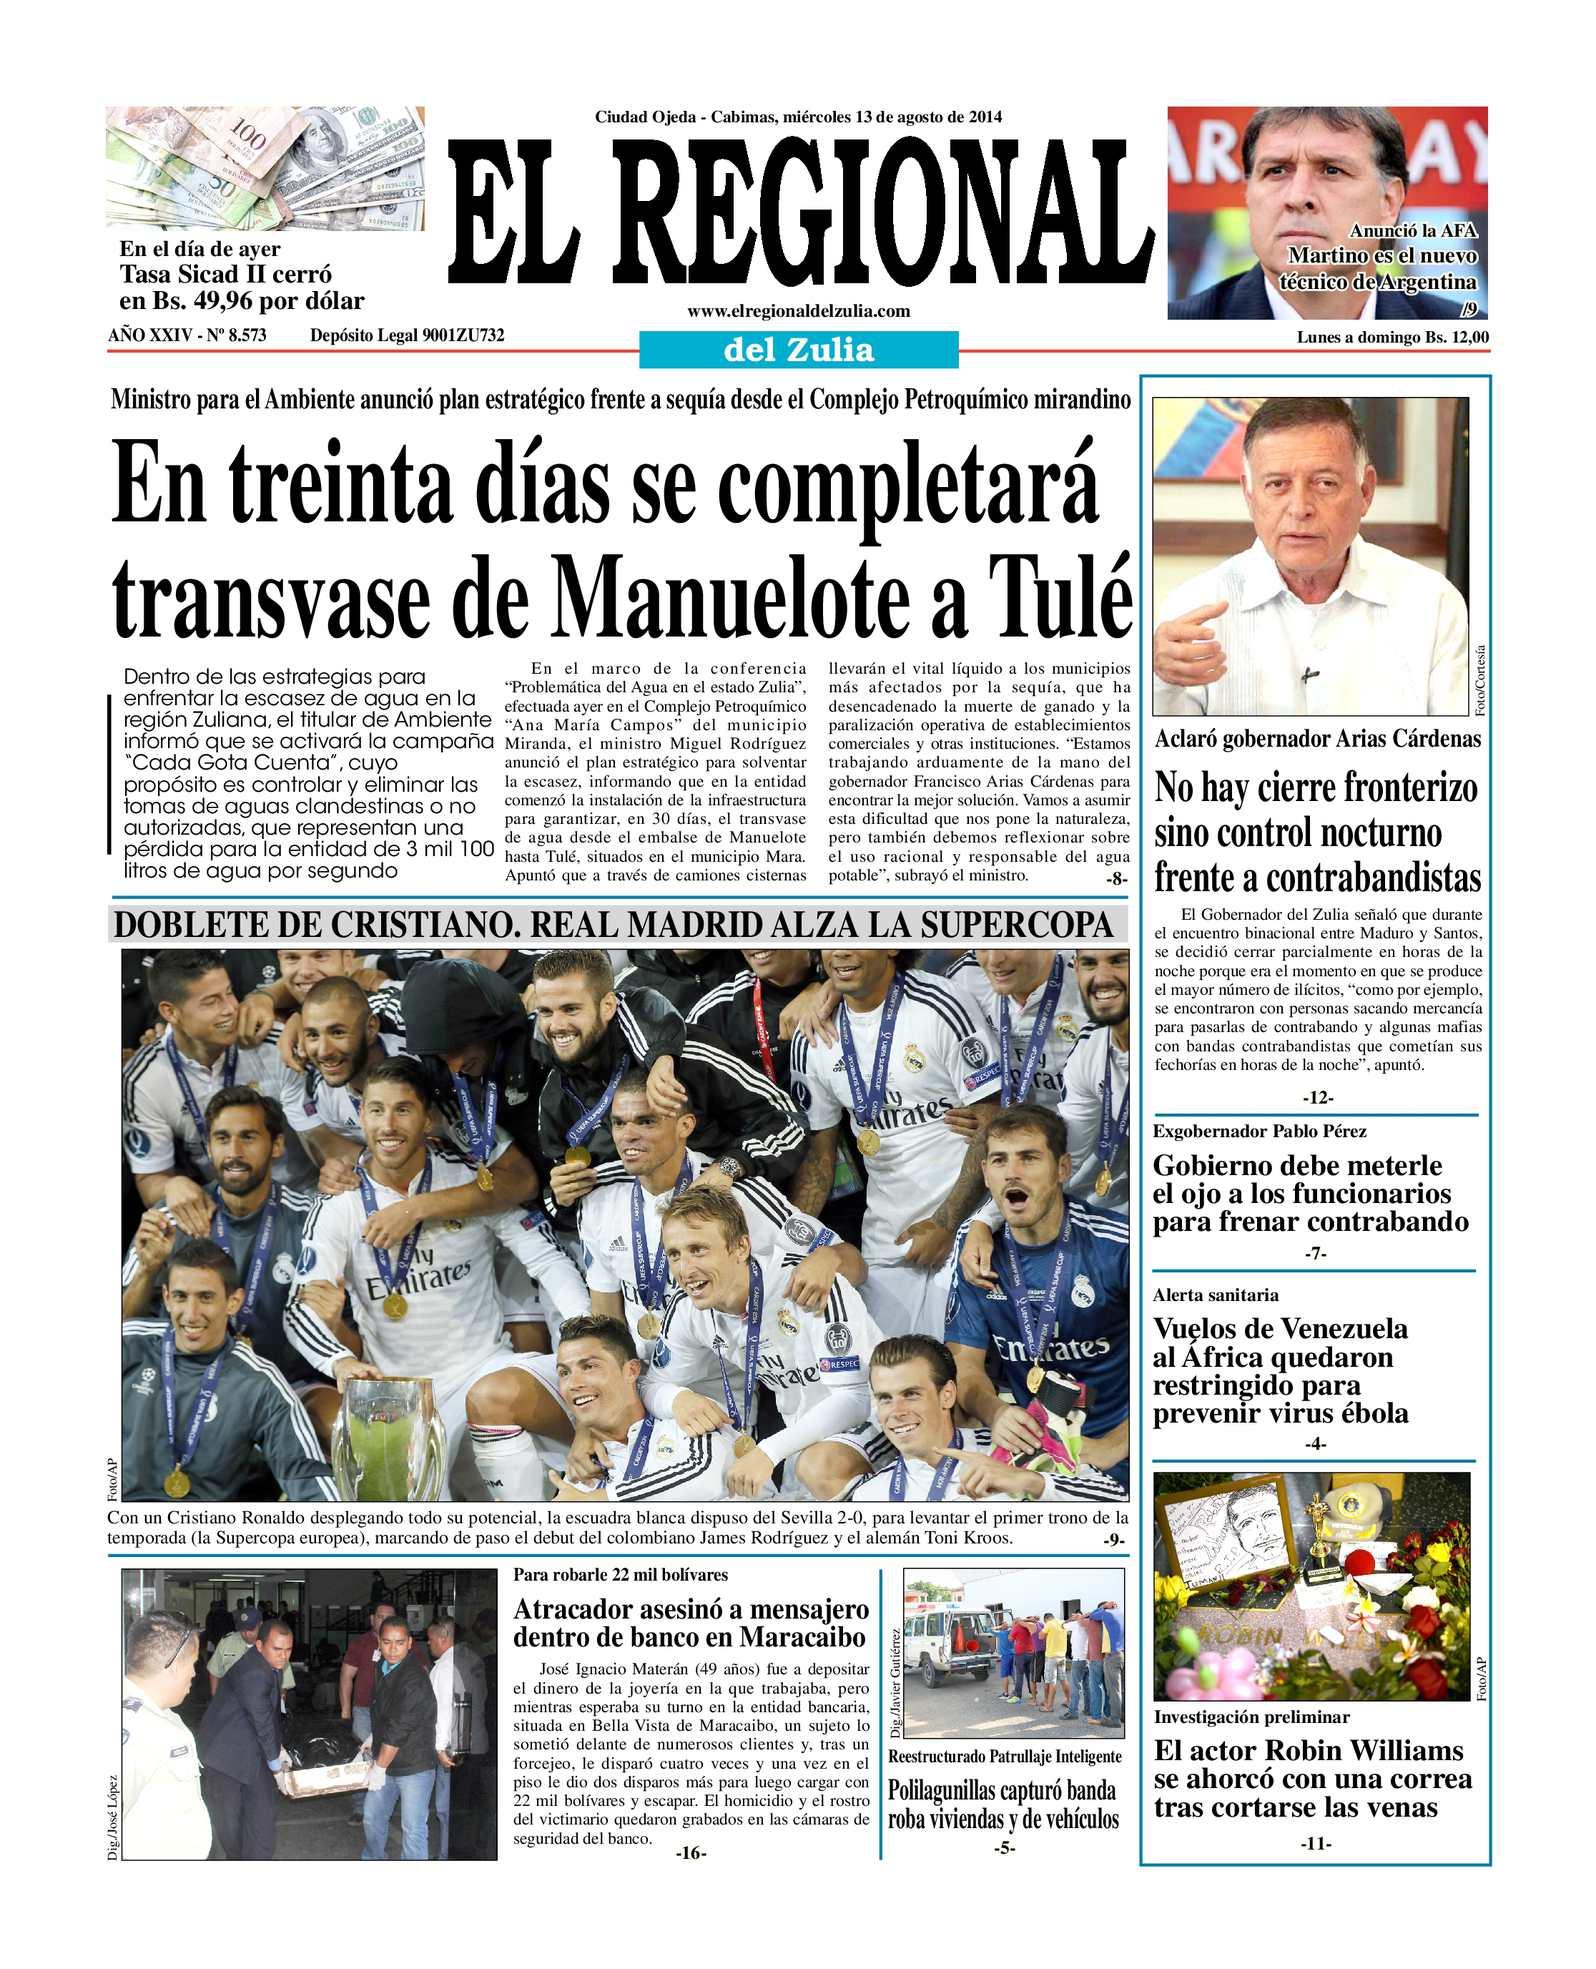 Calaméo - El Regional del Zulia 13-08-2014